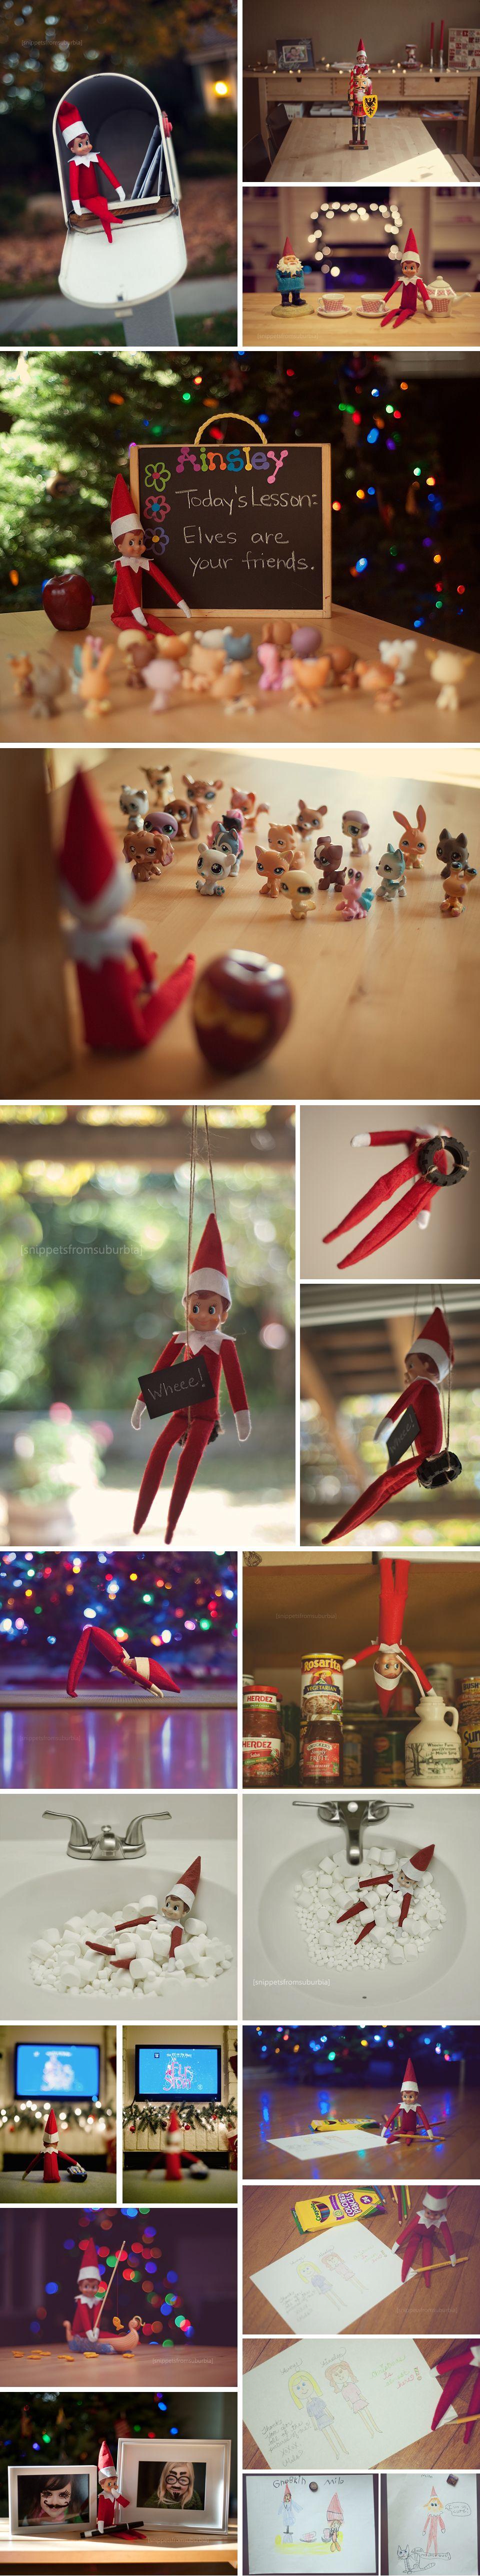 Elf on a Shelf Ideas, some of the cutest so far! | ELF ON THE SHELF ...